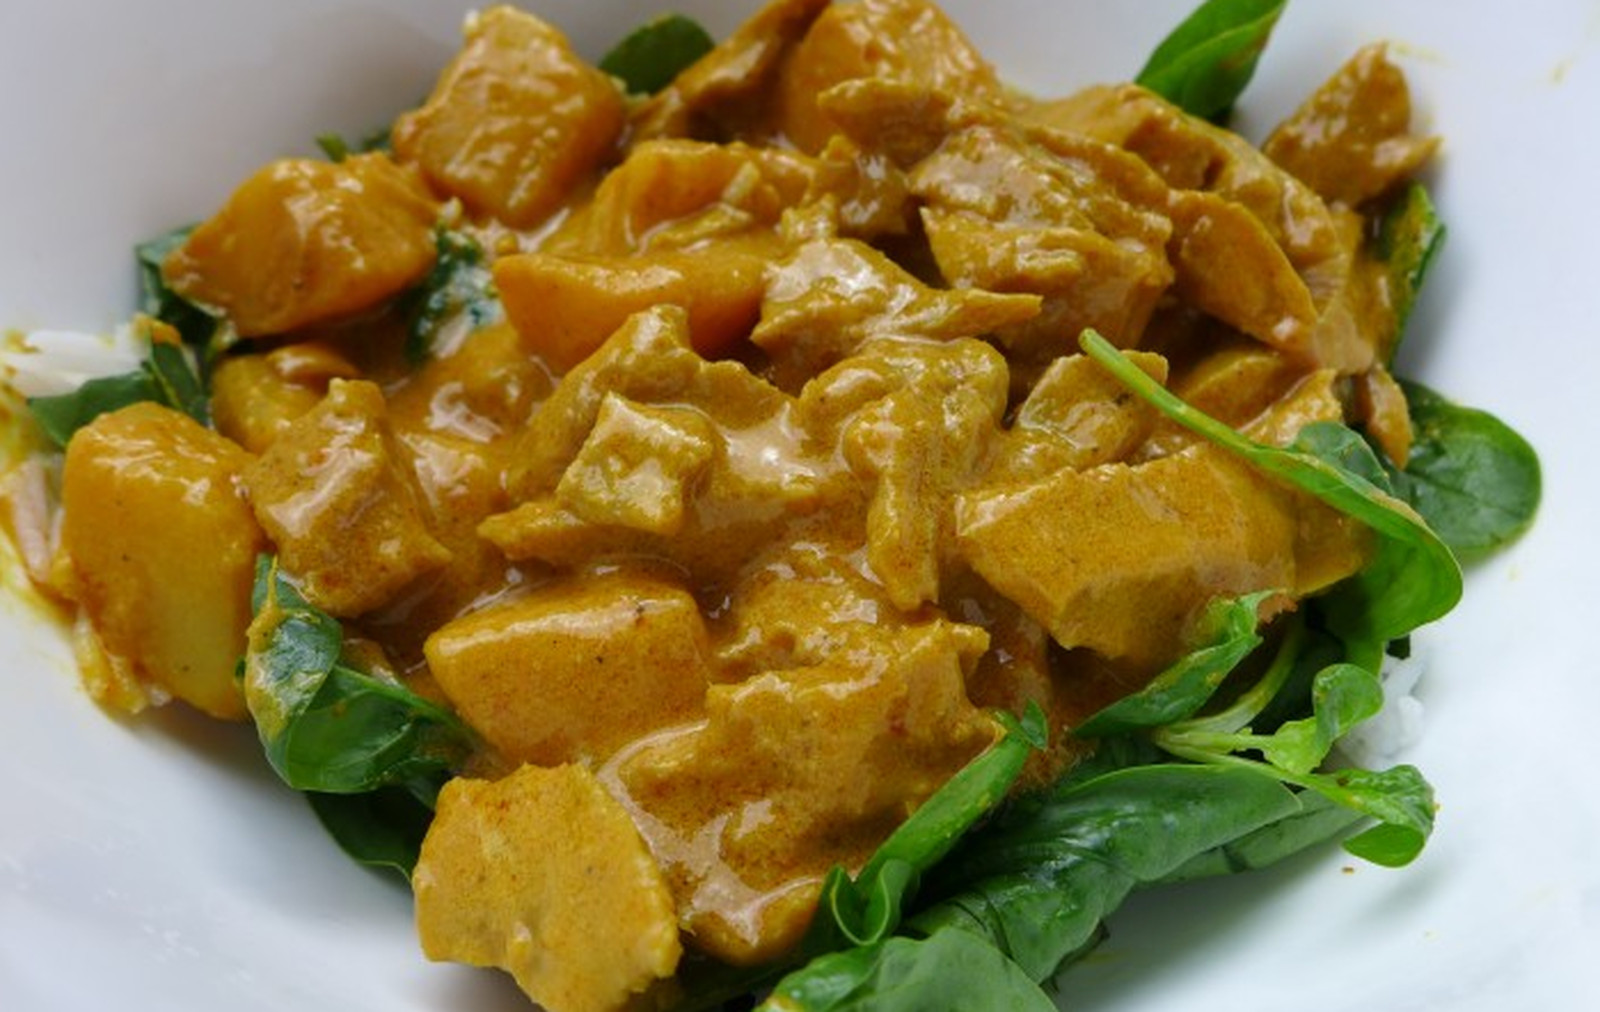 Vegan Thai Yellow Curry With Seitan and Potatoes